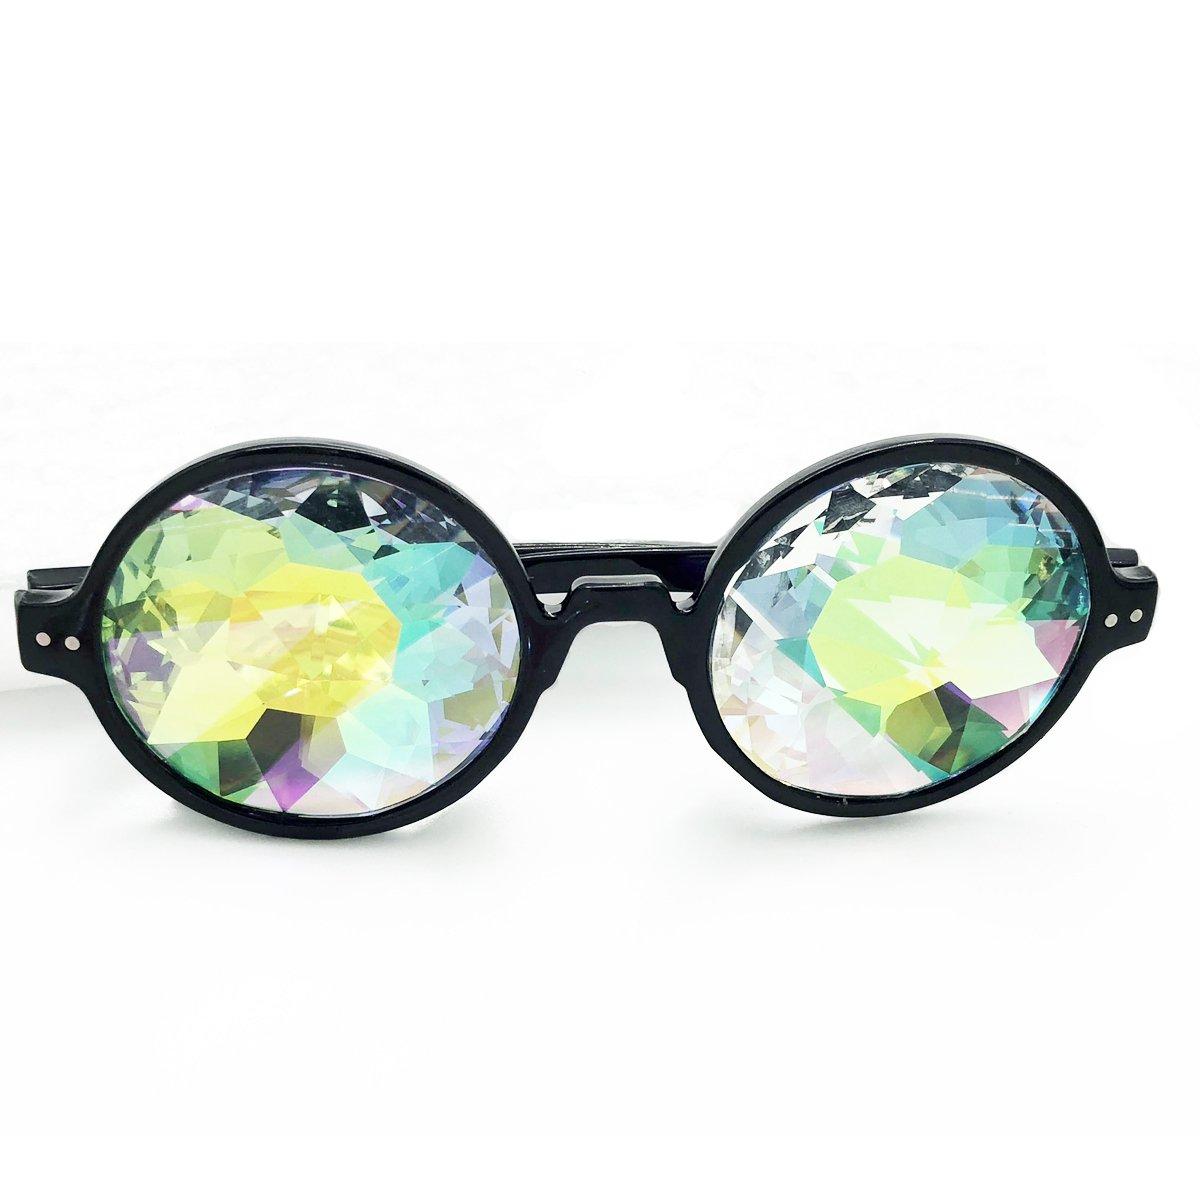 Kaleidoscope Glasses Rainbow Lens Festivals Rainbow Prism Sunglasses Goggles by Winroor